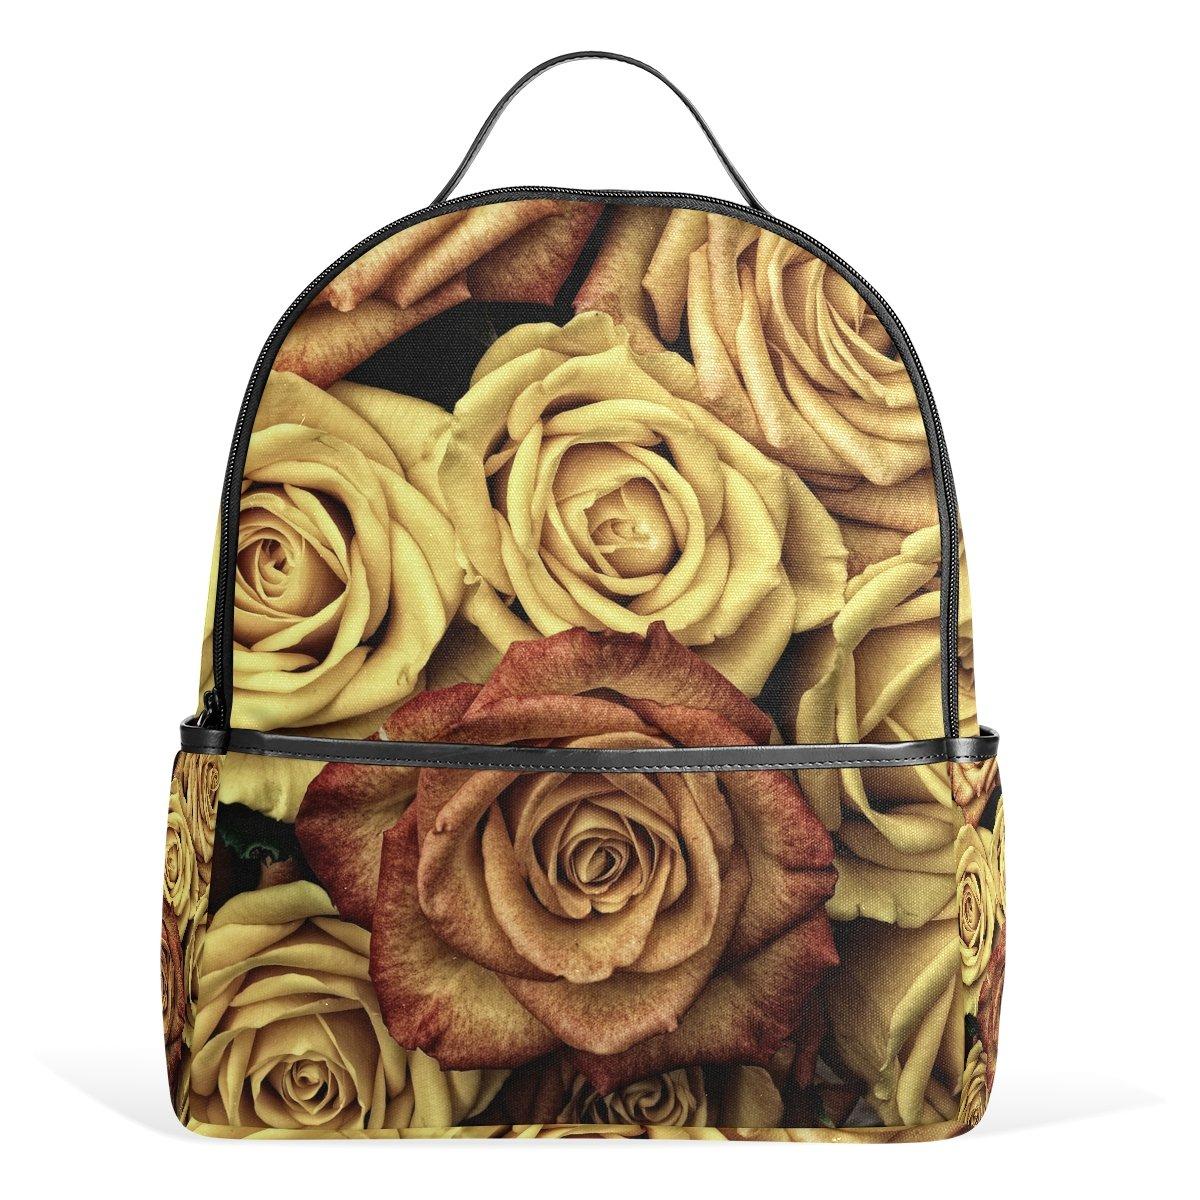 FBTRUST Yellow Rose Flower pattern Casual Backpack School Bag Hiking Travel Daypack 13Inch laptop bag for Boys Teen Girls